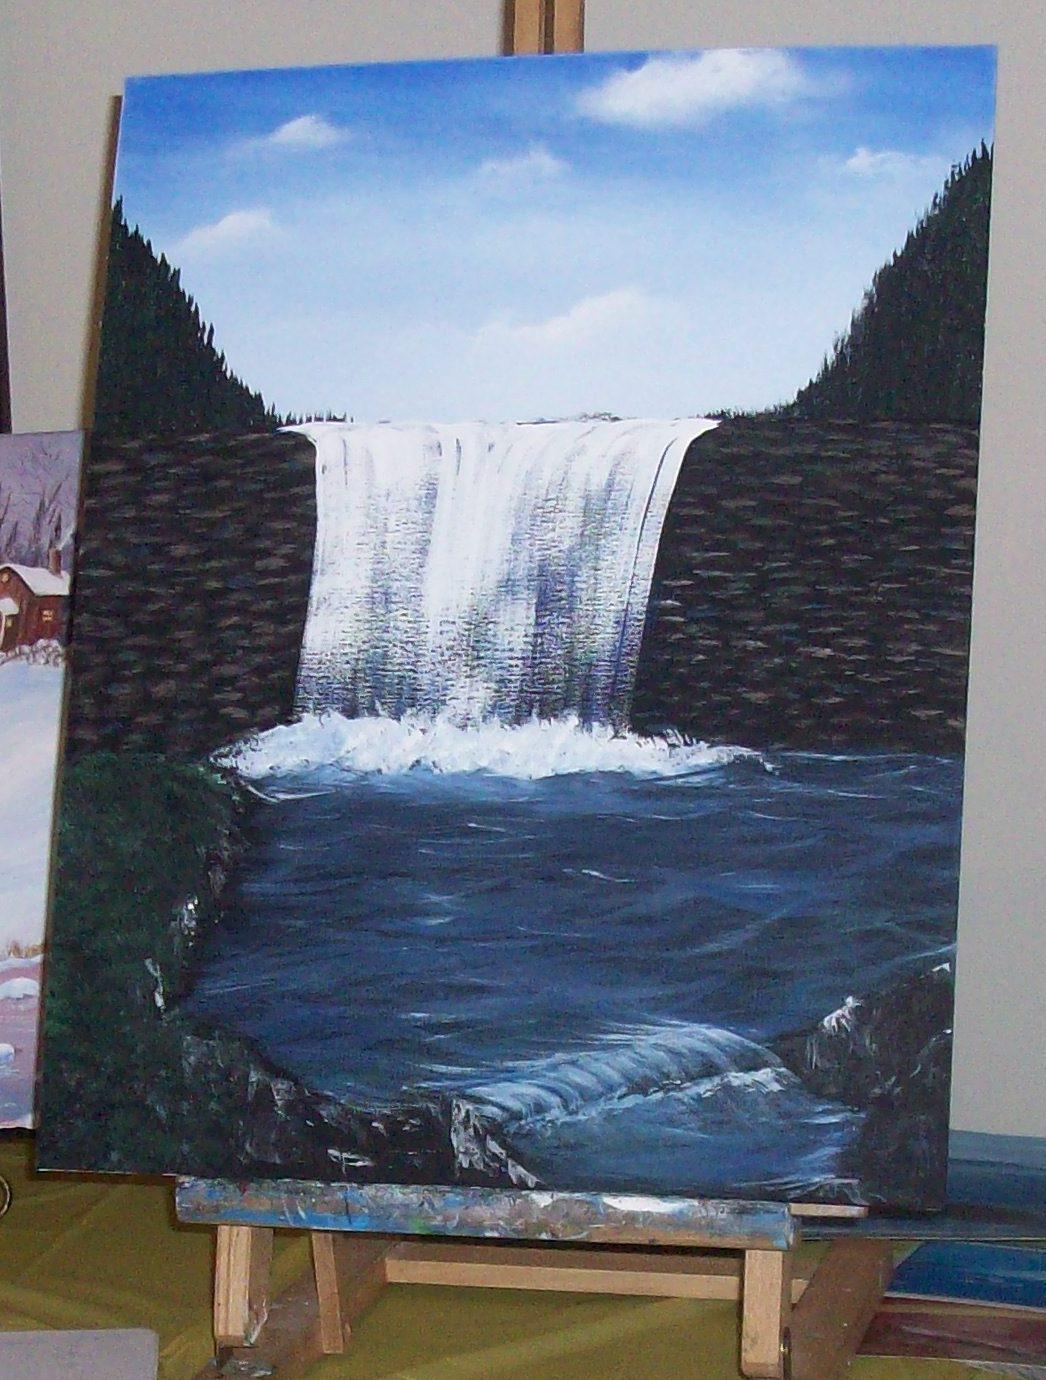 Add Rocks and a small falls.